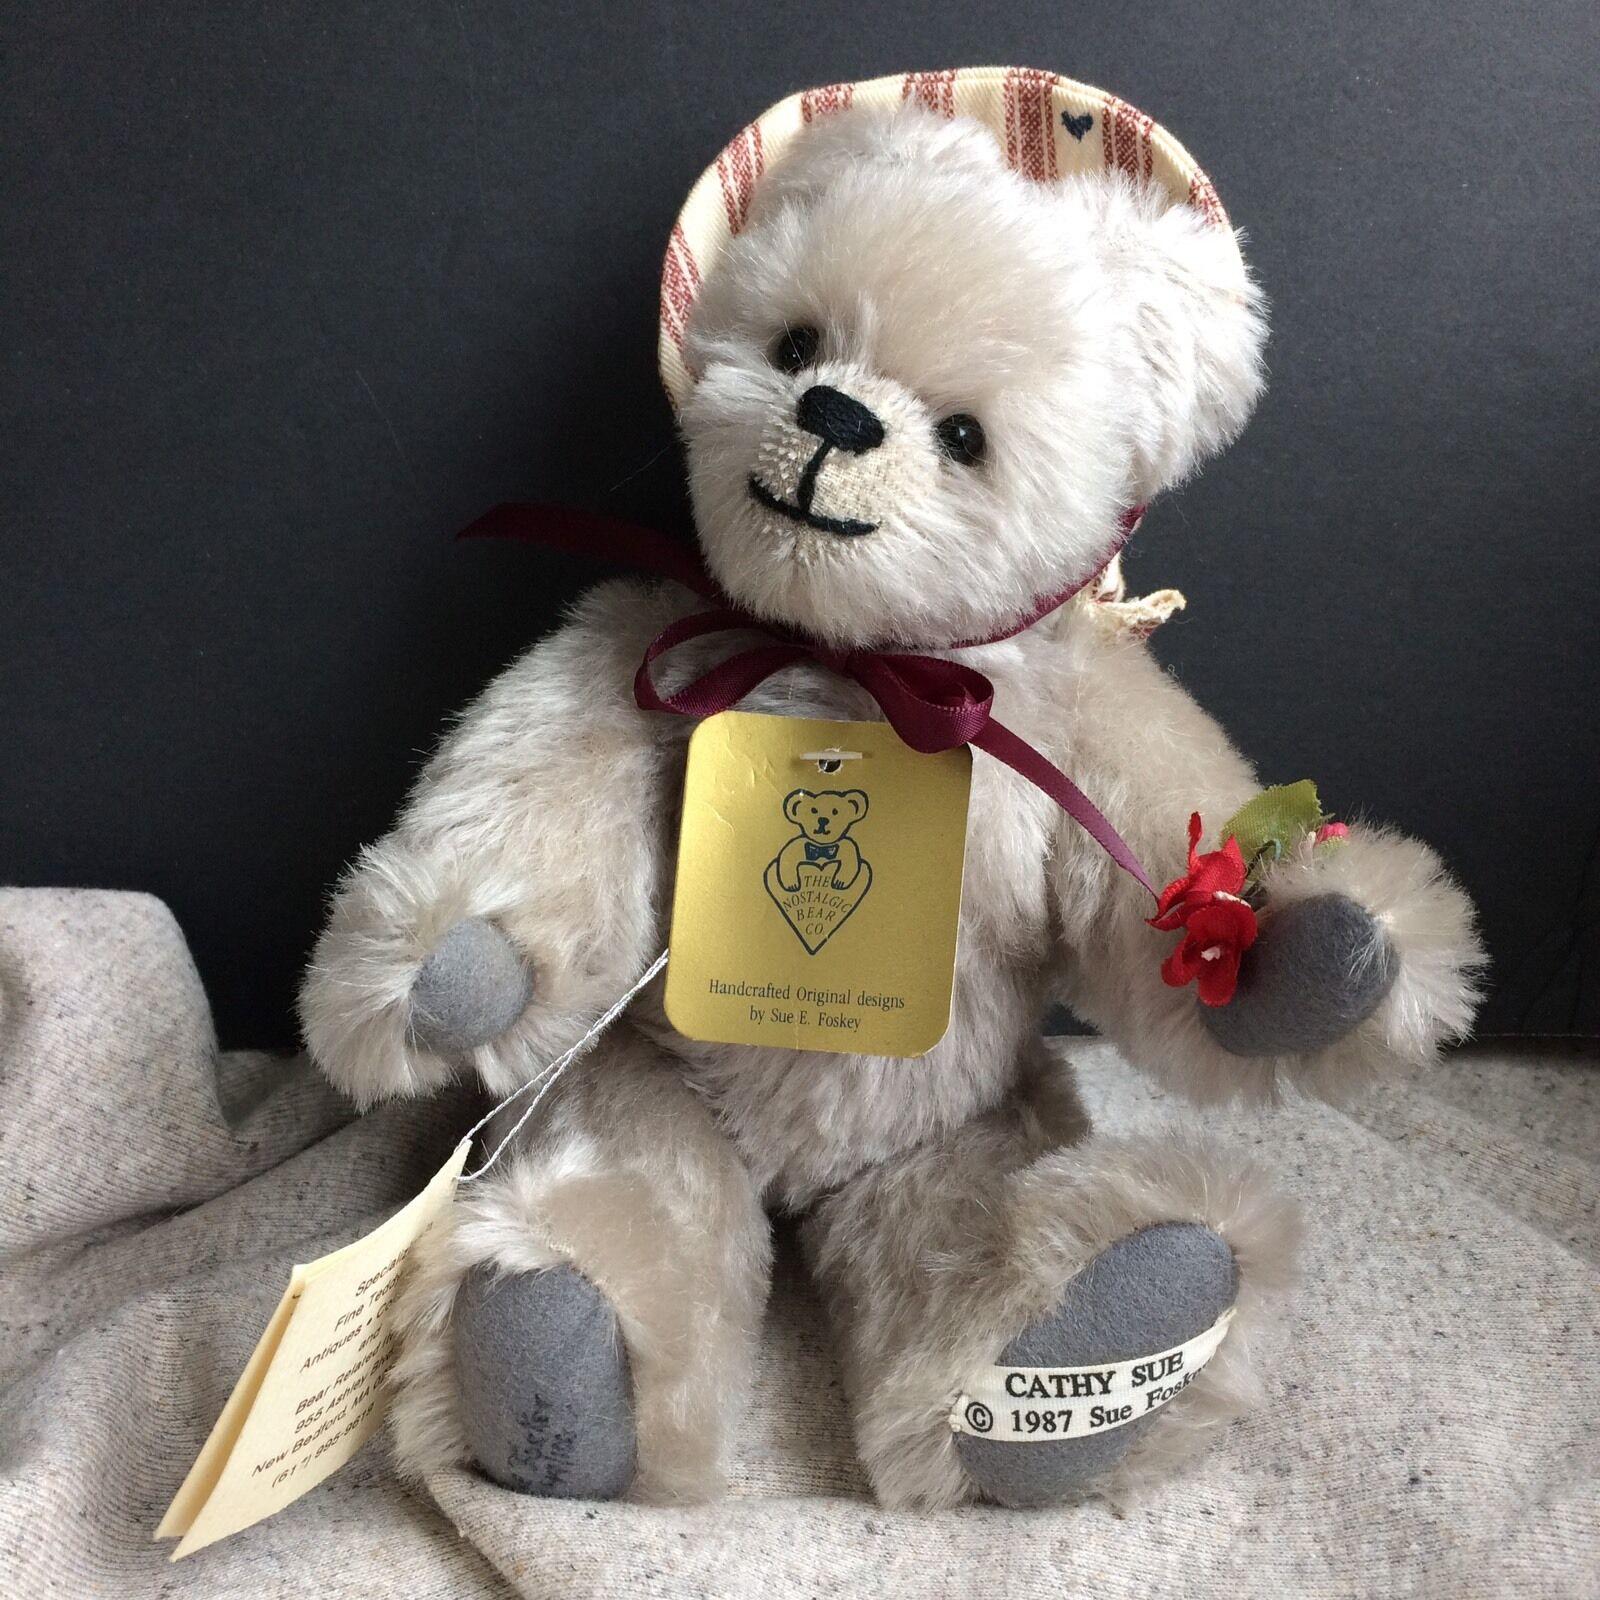 Artist orso signed by Sue Sue Sue Foschiave,Cathy Sue No-No orso, Rare Limited edizione 0b9c2a